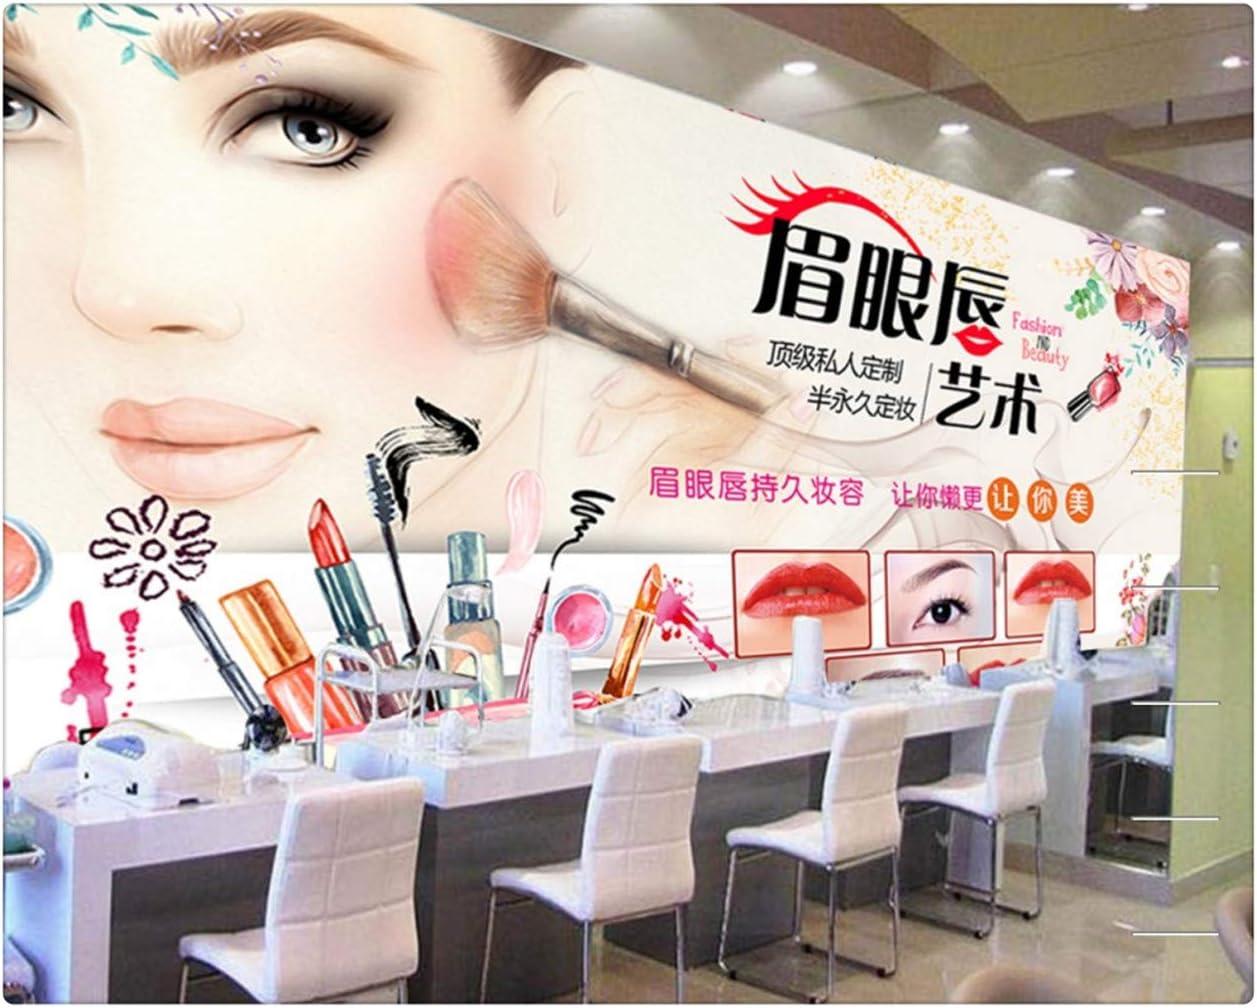 Fashion Brick Wall Cosmetics Shop Decoration Wallpaper Beauty Nail Shop 3d Photo Mural Makeup Store Mural 150cmx105cm Amazon Com